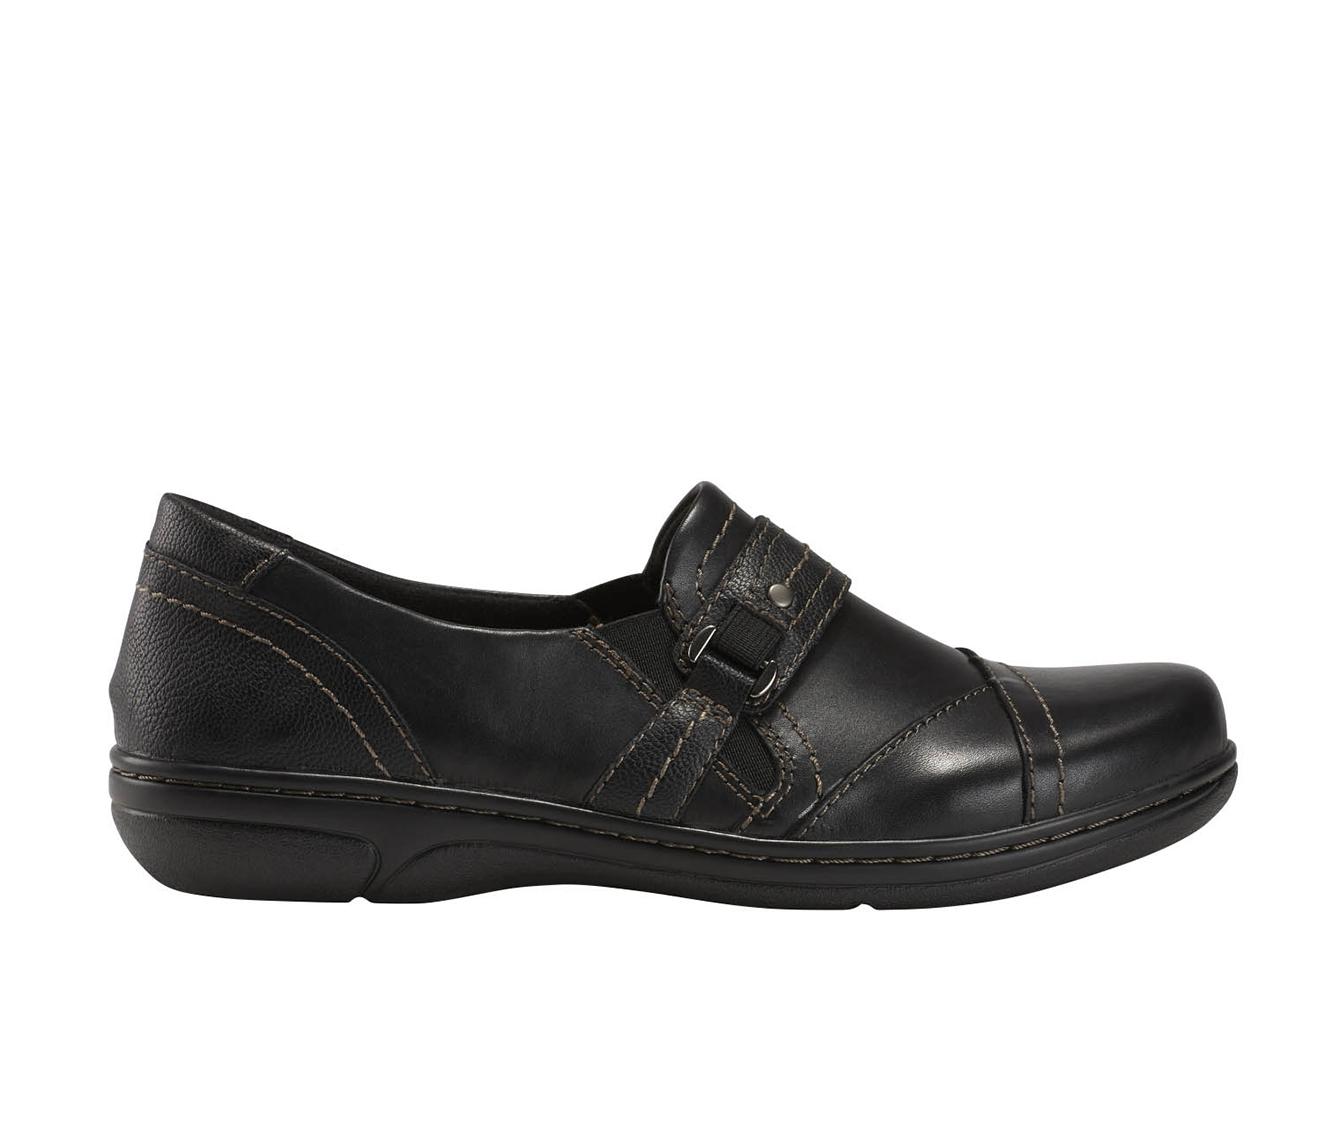 Earth Origins Glendale Gloria Women's Shoe (Black Leather)